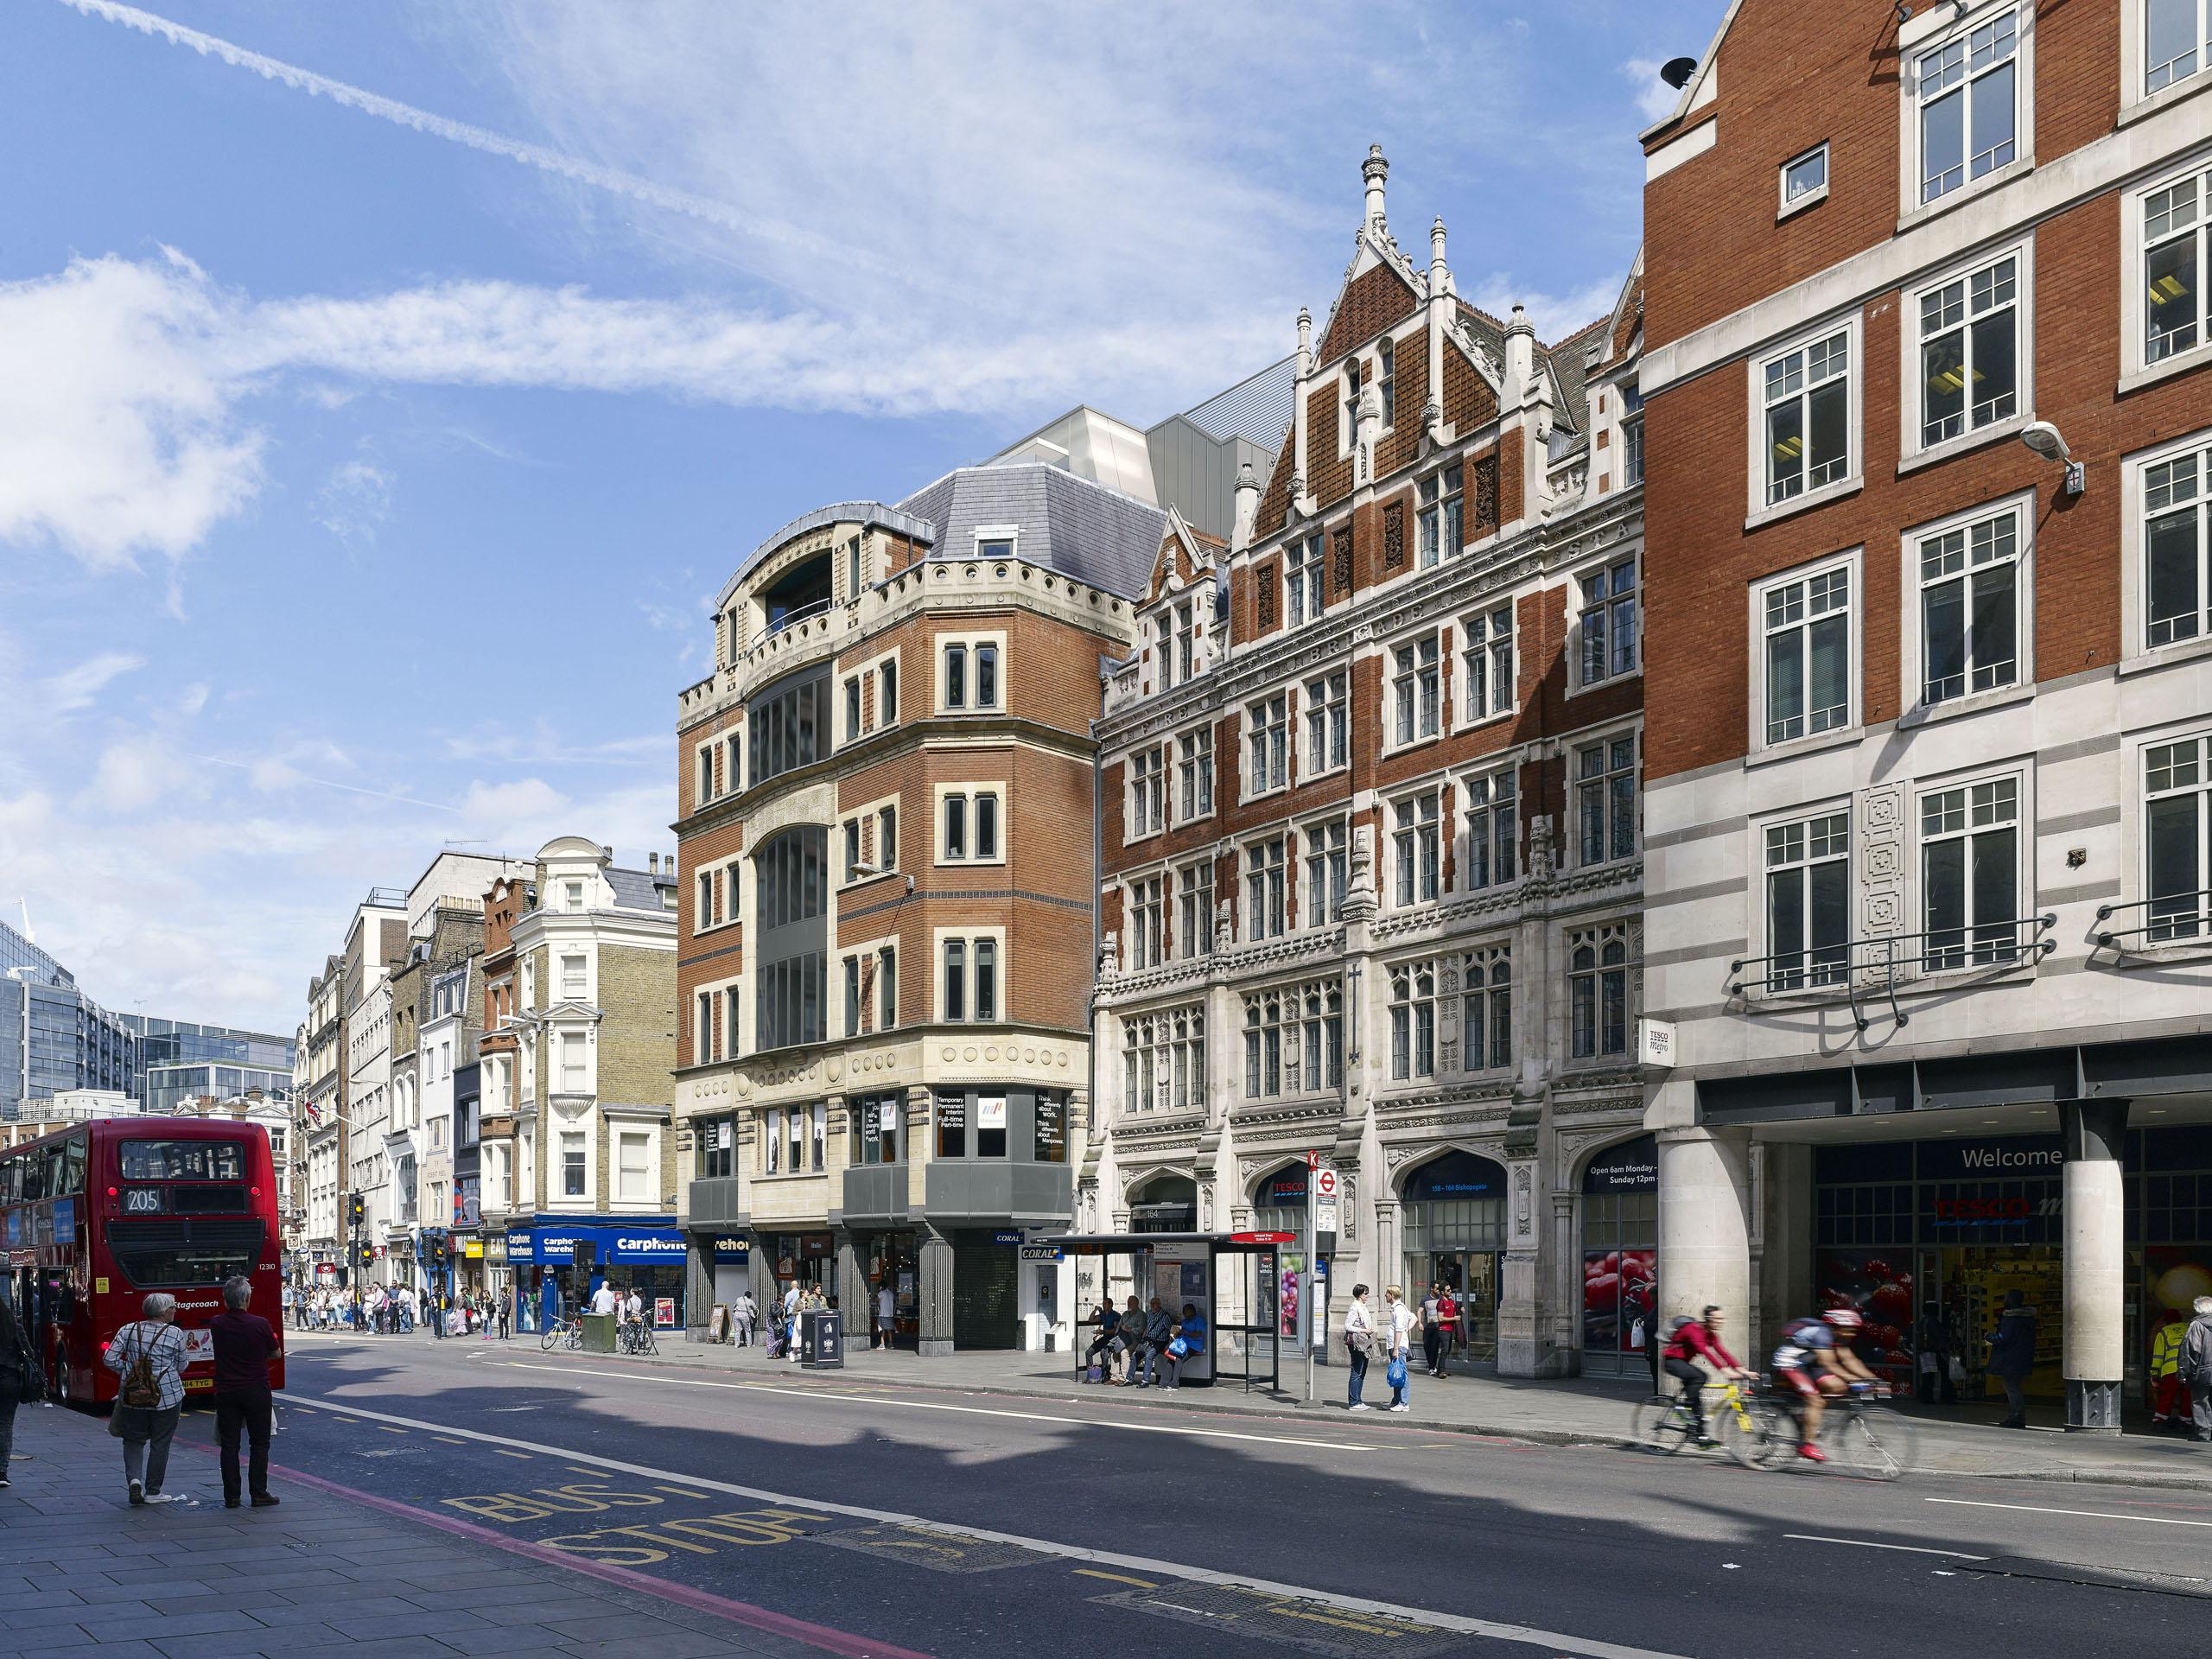 14 New Street London Ec3 Refurbishment Project By Garnett